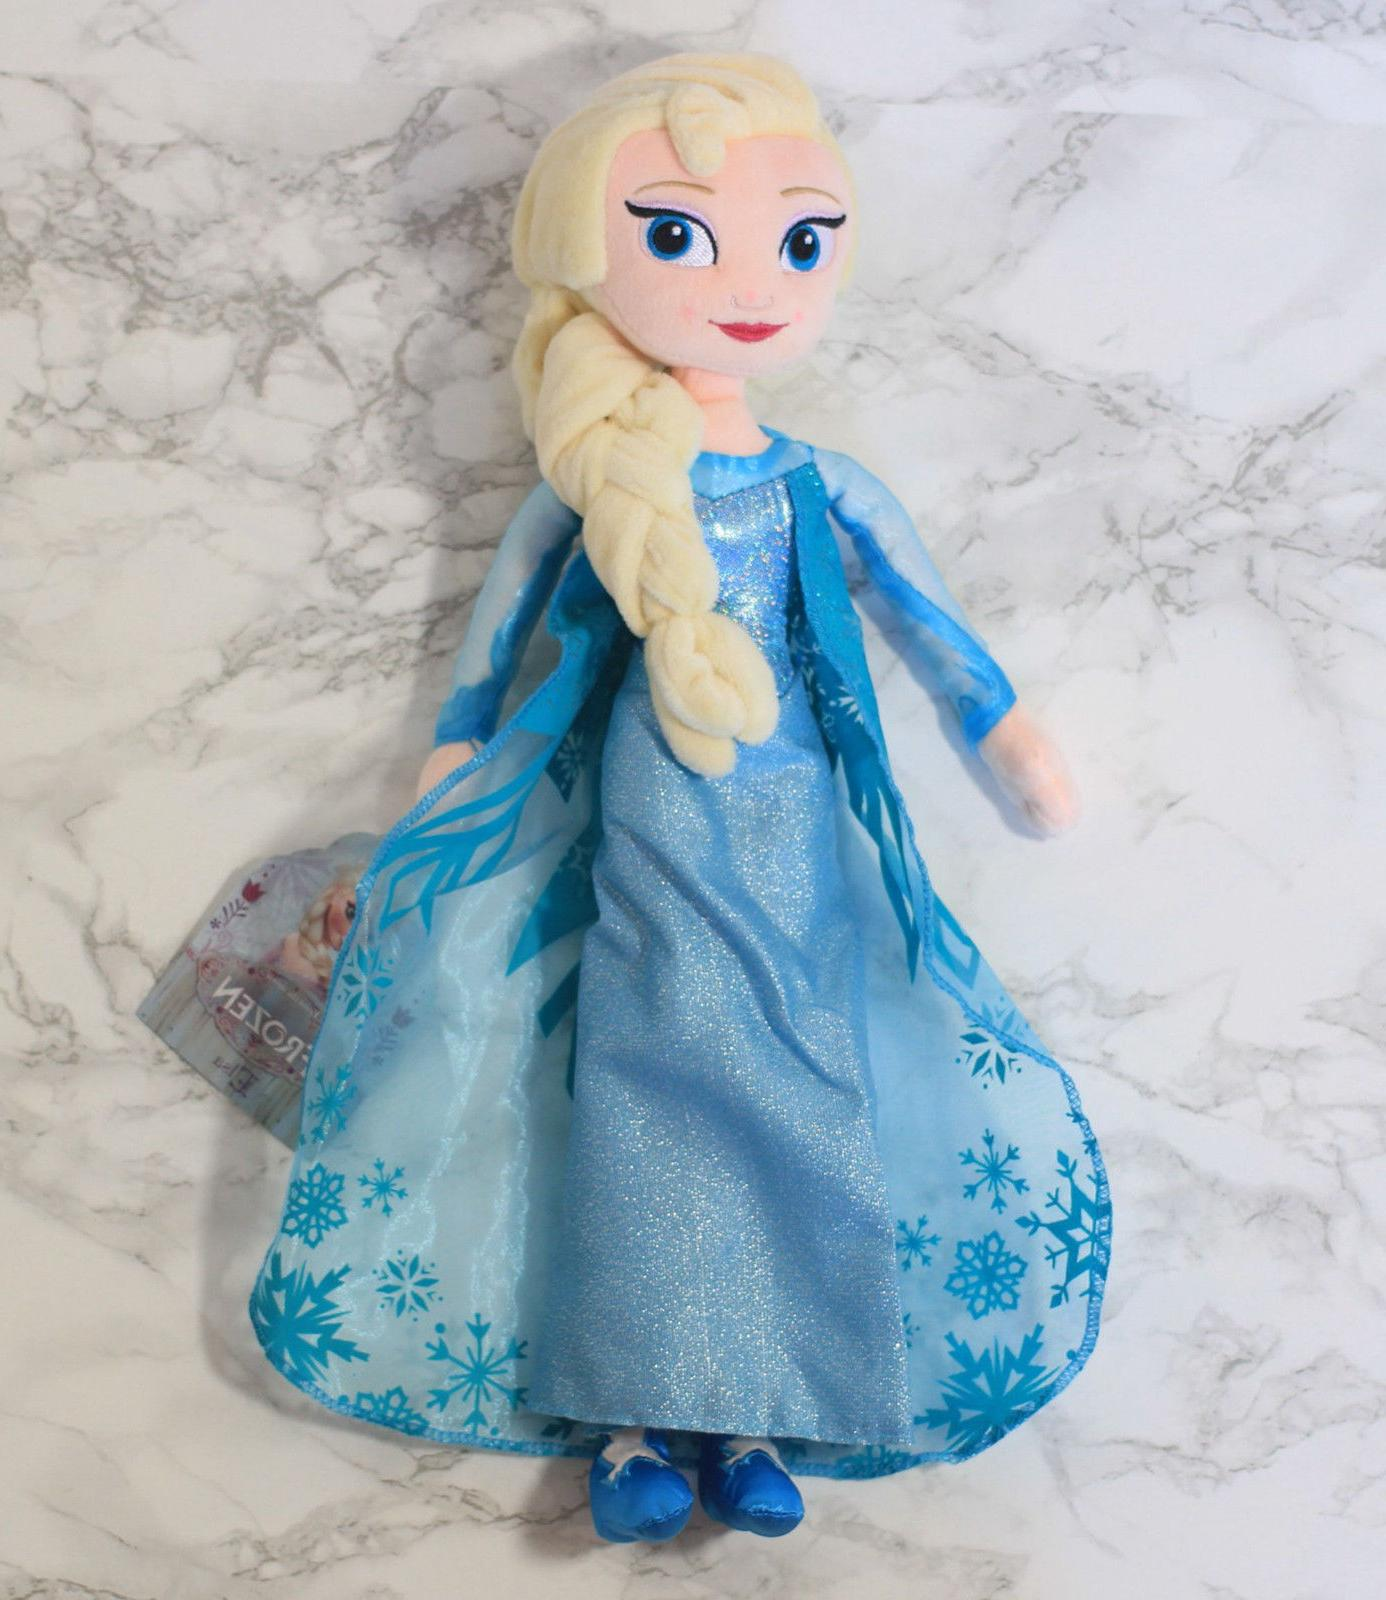 "Birthday Gift 16"" Frozen Elsa Disney Stuffed Plush Doll"